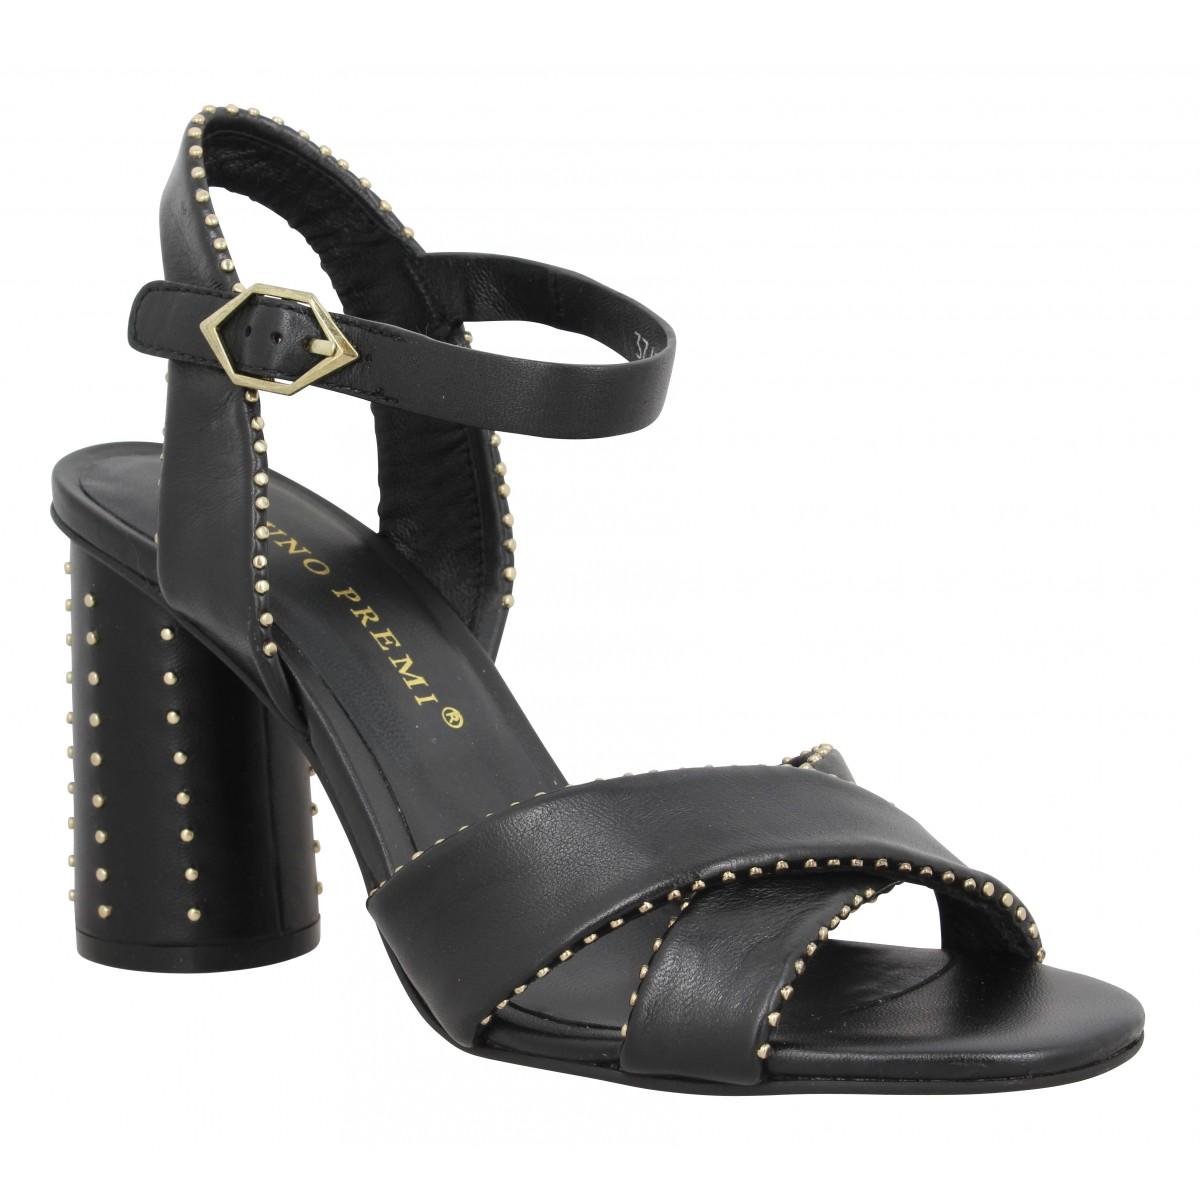 Sandales talons BRUNO PREMI 340 cuir Femme Noir